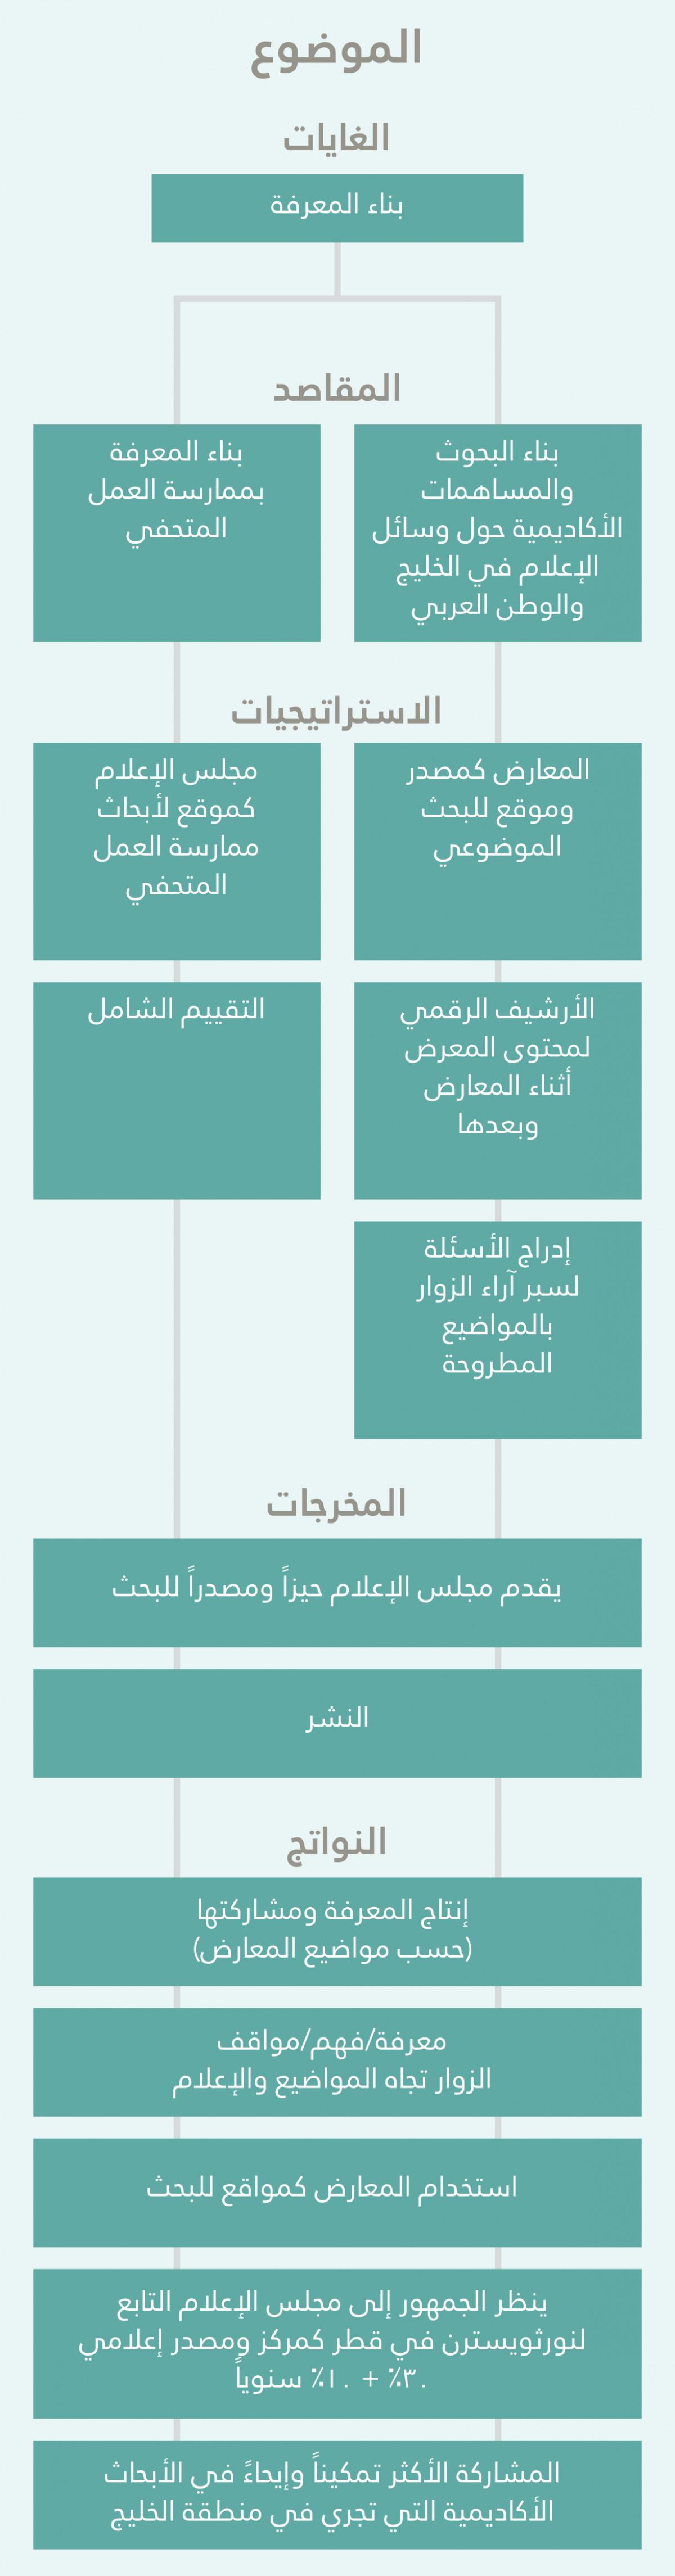 ar-media-majilis-strategy-tree-column-4-adjusted-copy.jpg